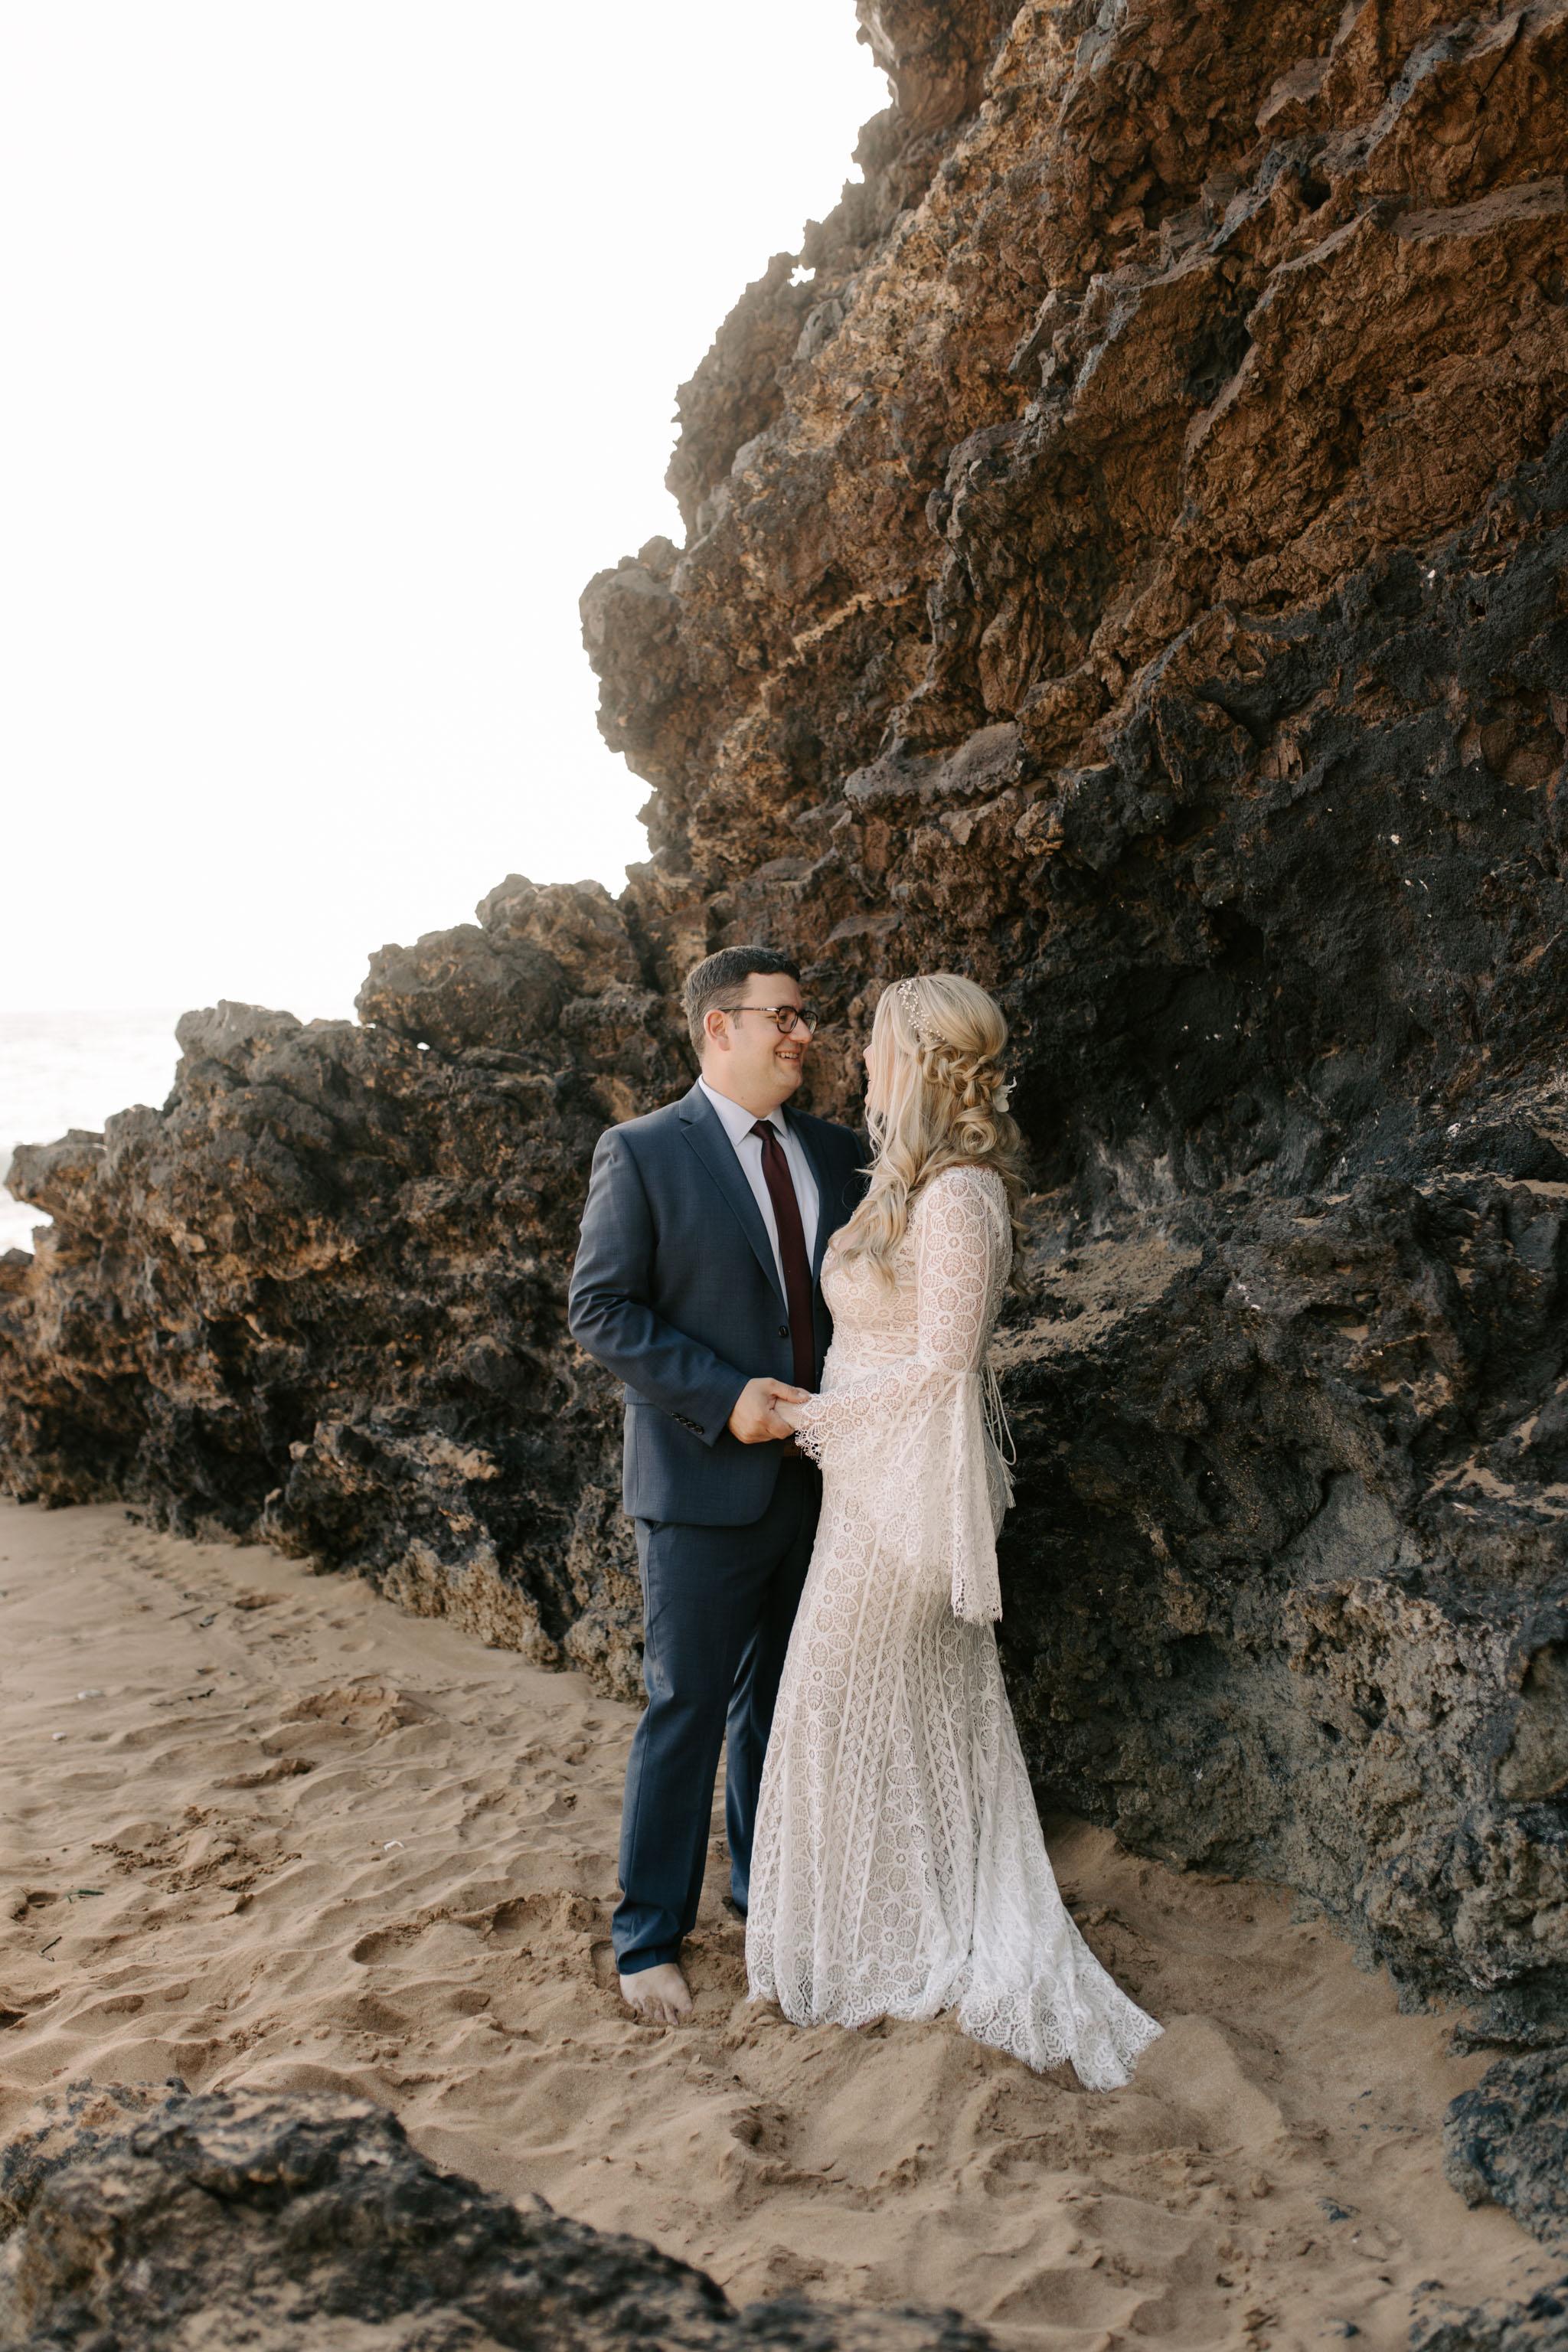 BHLDN Long Sleeve Wedding Dress - Andaz Maui and Puulenalena Beach Vow Renewal By Hawaii Wedding Photographer Desiree Leilani